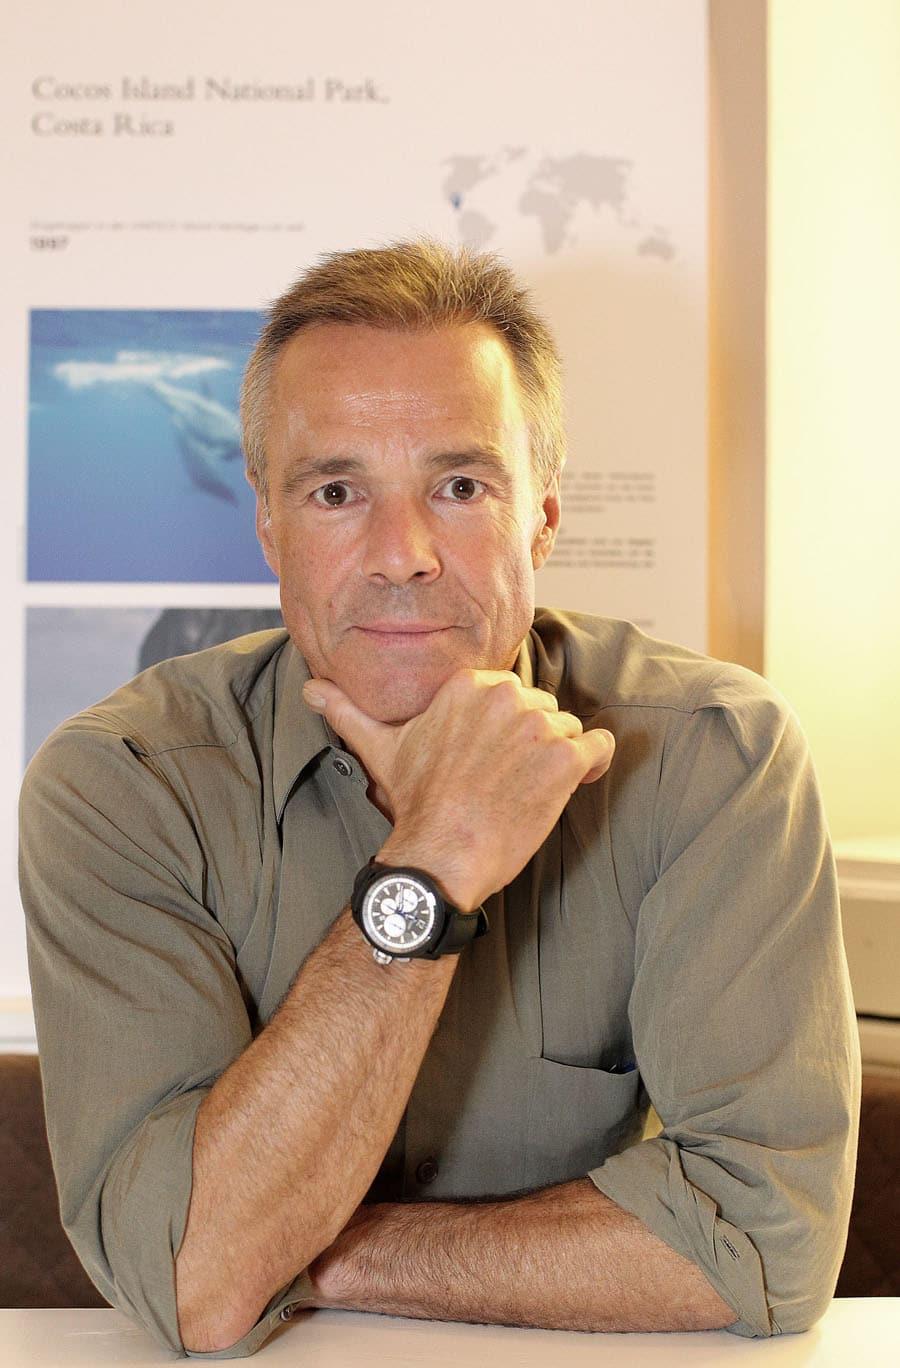 Hannes Jaenicke trägt den Master Compressor Chronograph Ceramic von Jaeger-LeCoultre